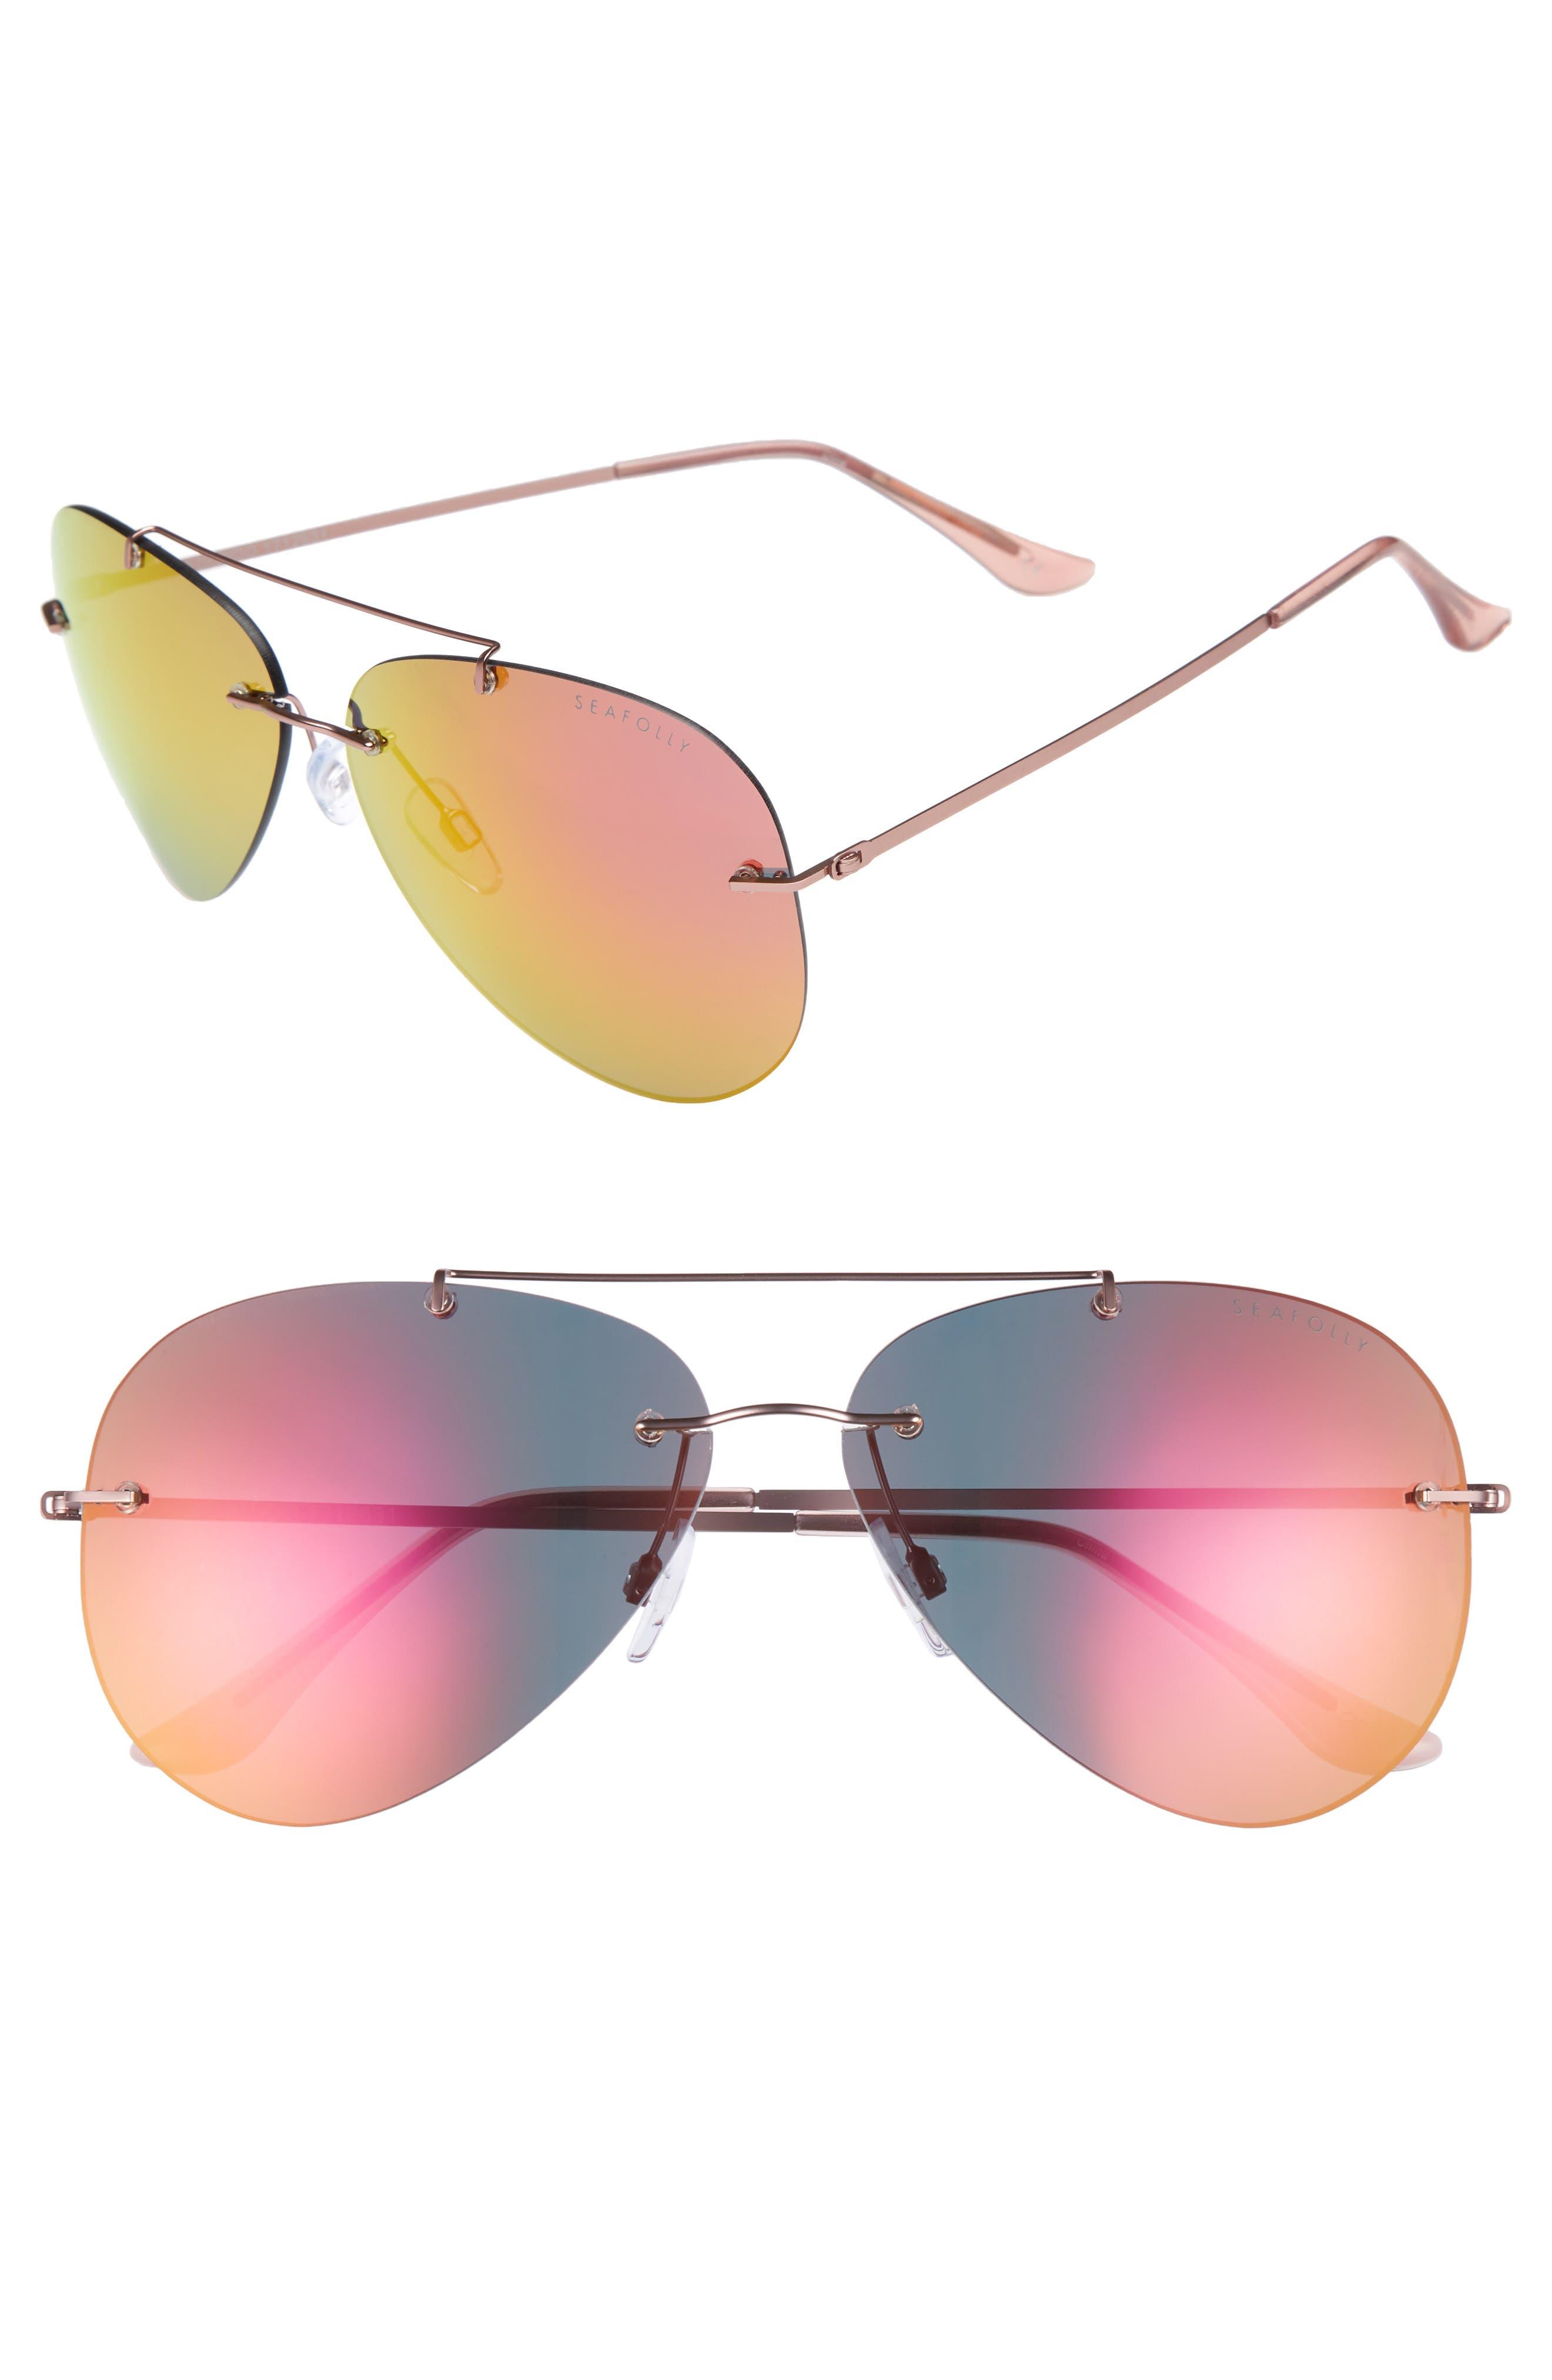 Redondo 61mm Rimless Aviator Sunglasses,                             Main thumbnail 1, color,                             Nectarine